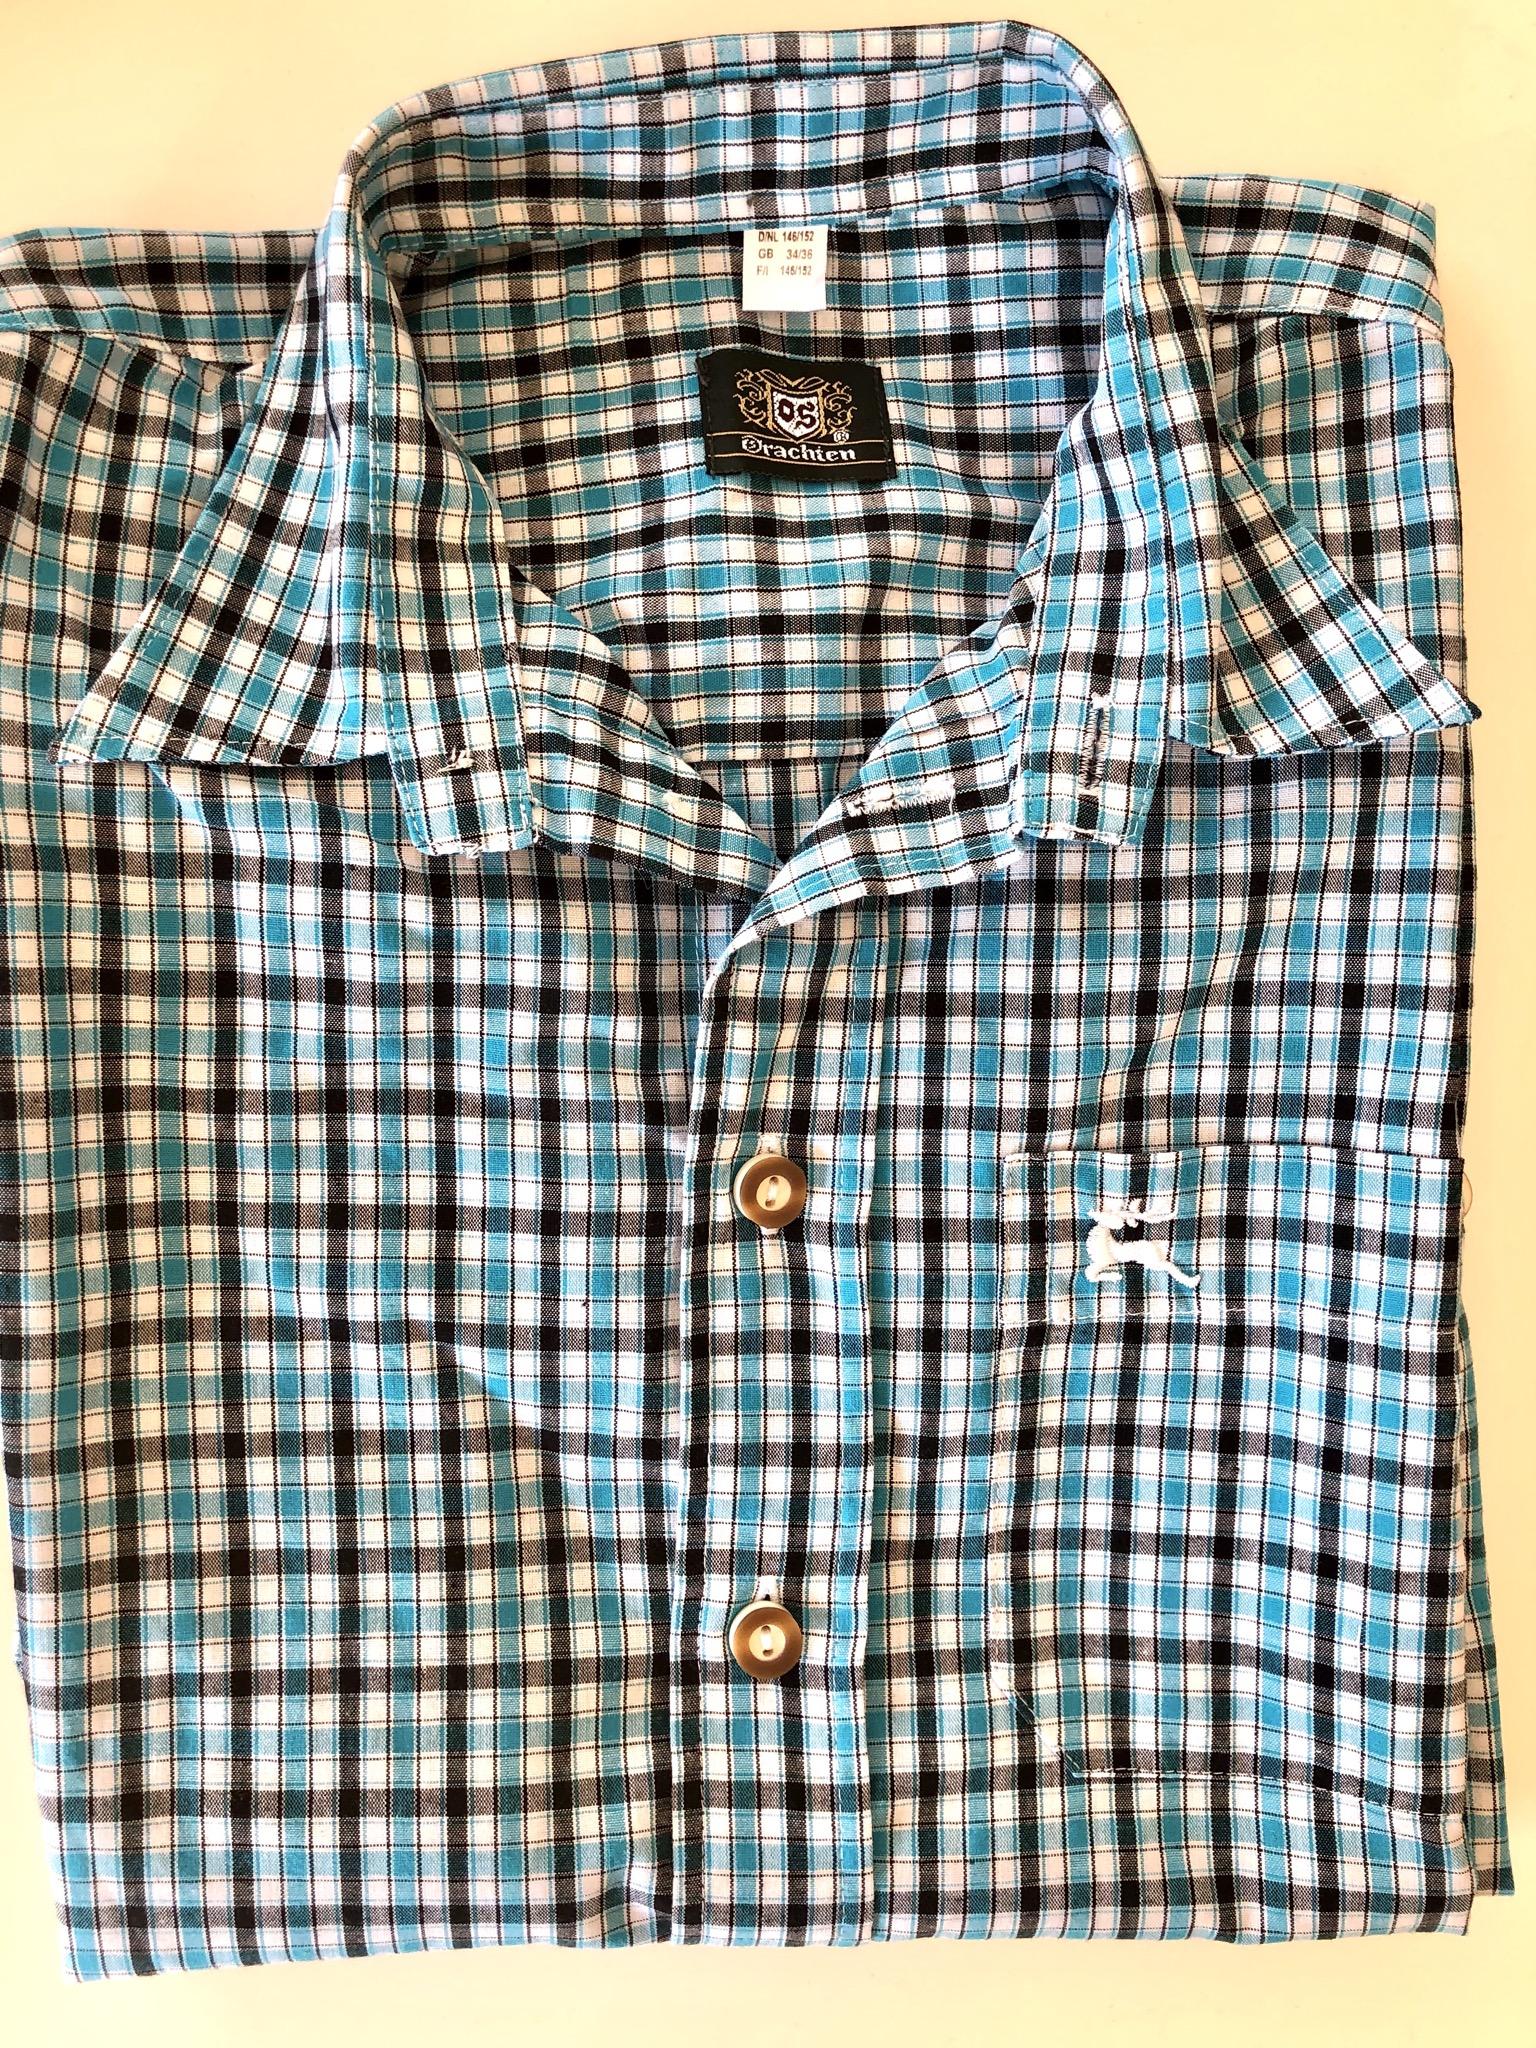 Gr. 146-152 OS Trachten Trachtenhemd blau